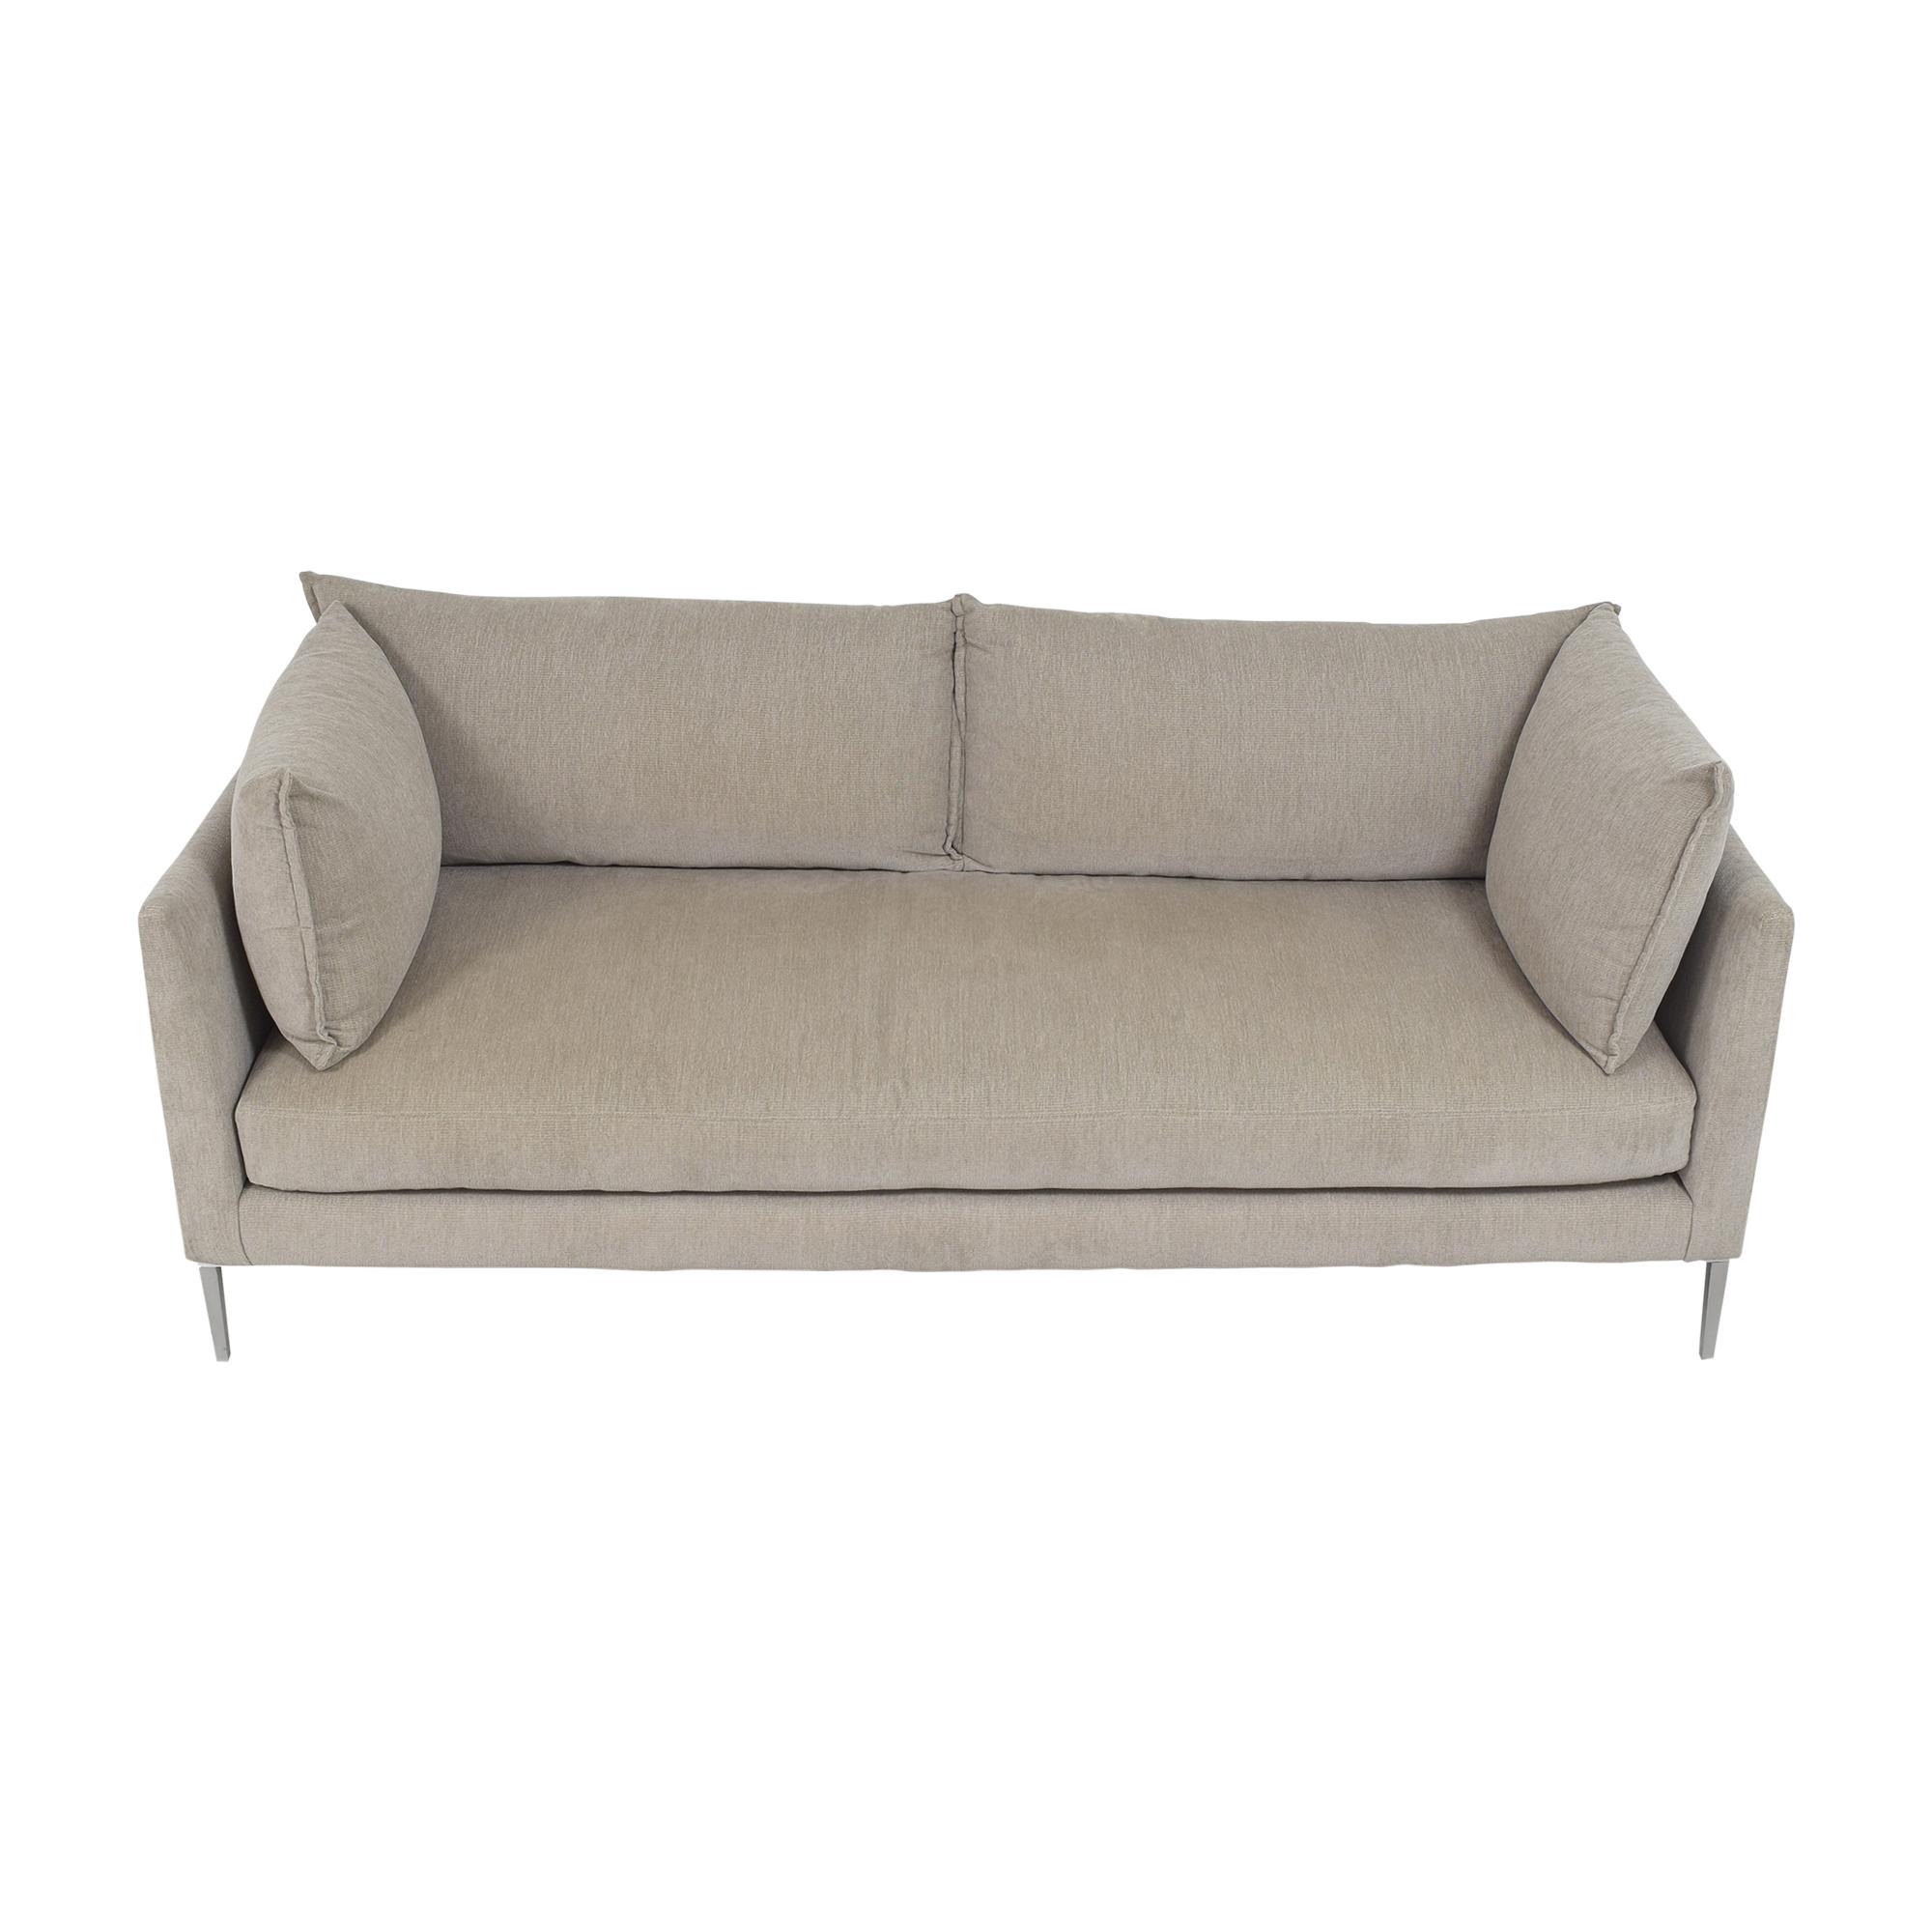 shop Room & Board Room & Board Vela Sofa online